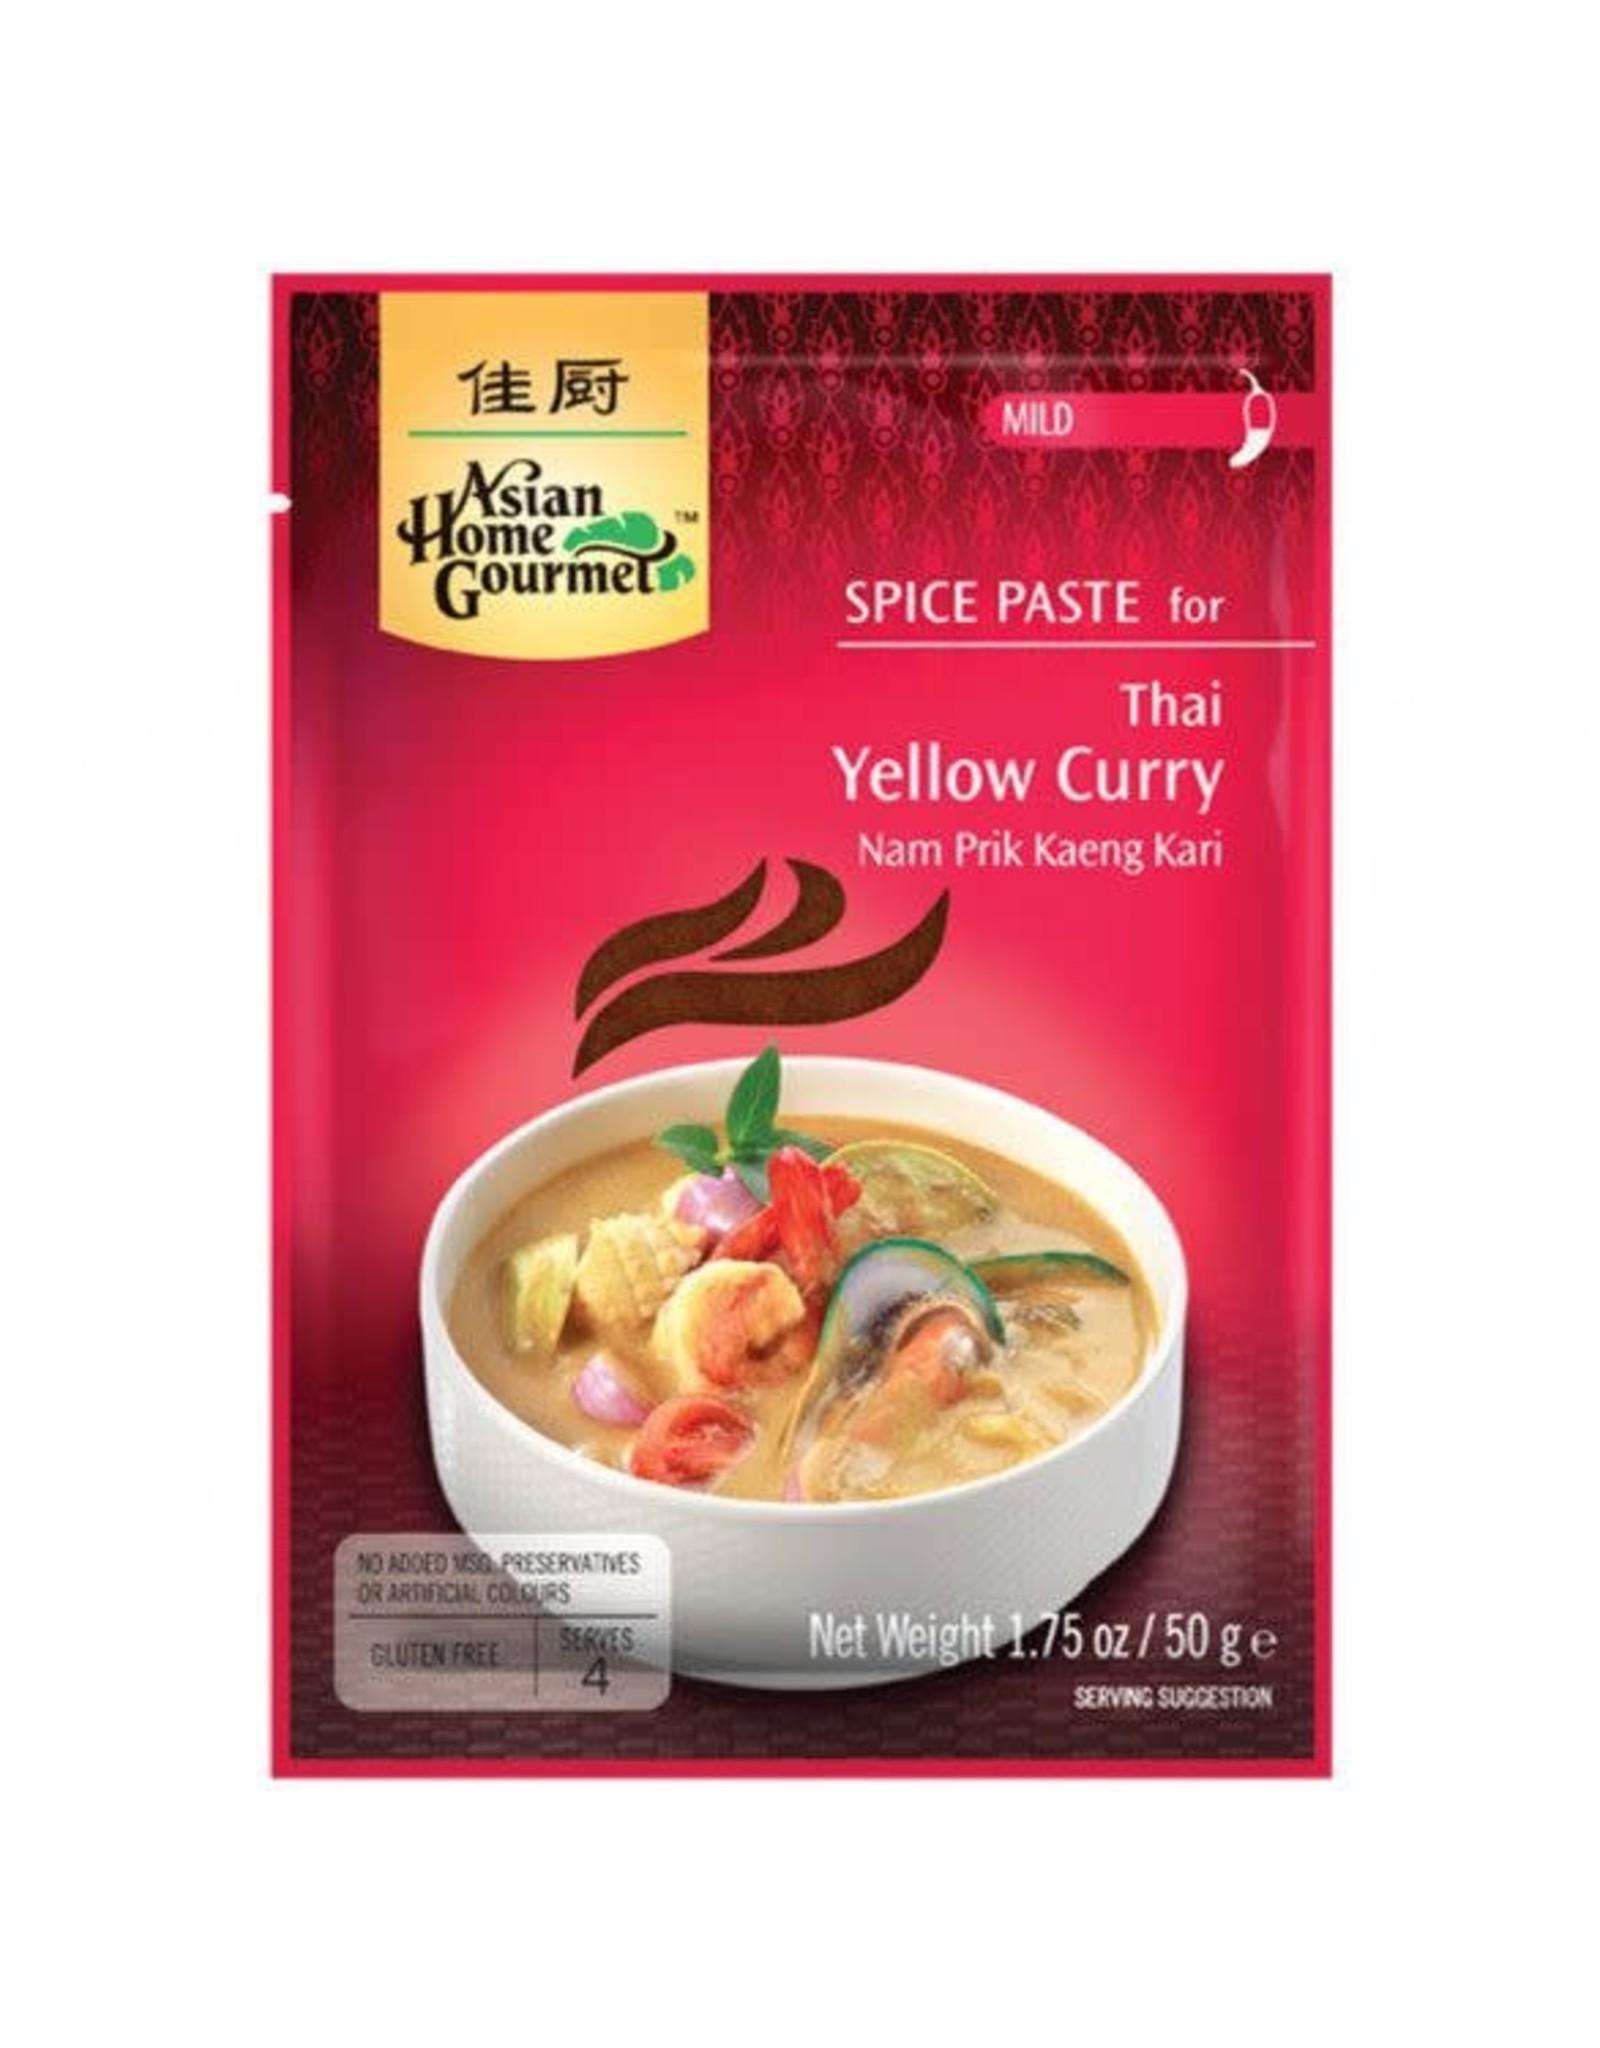 AHG Spice paste Thai yellow curry AHG 50g